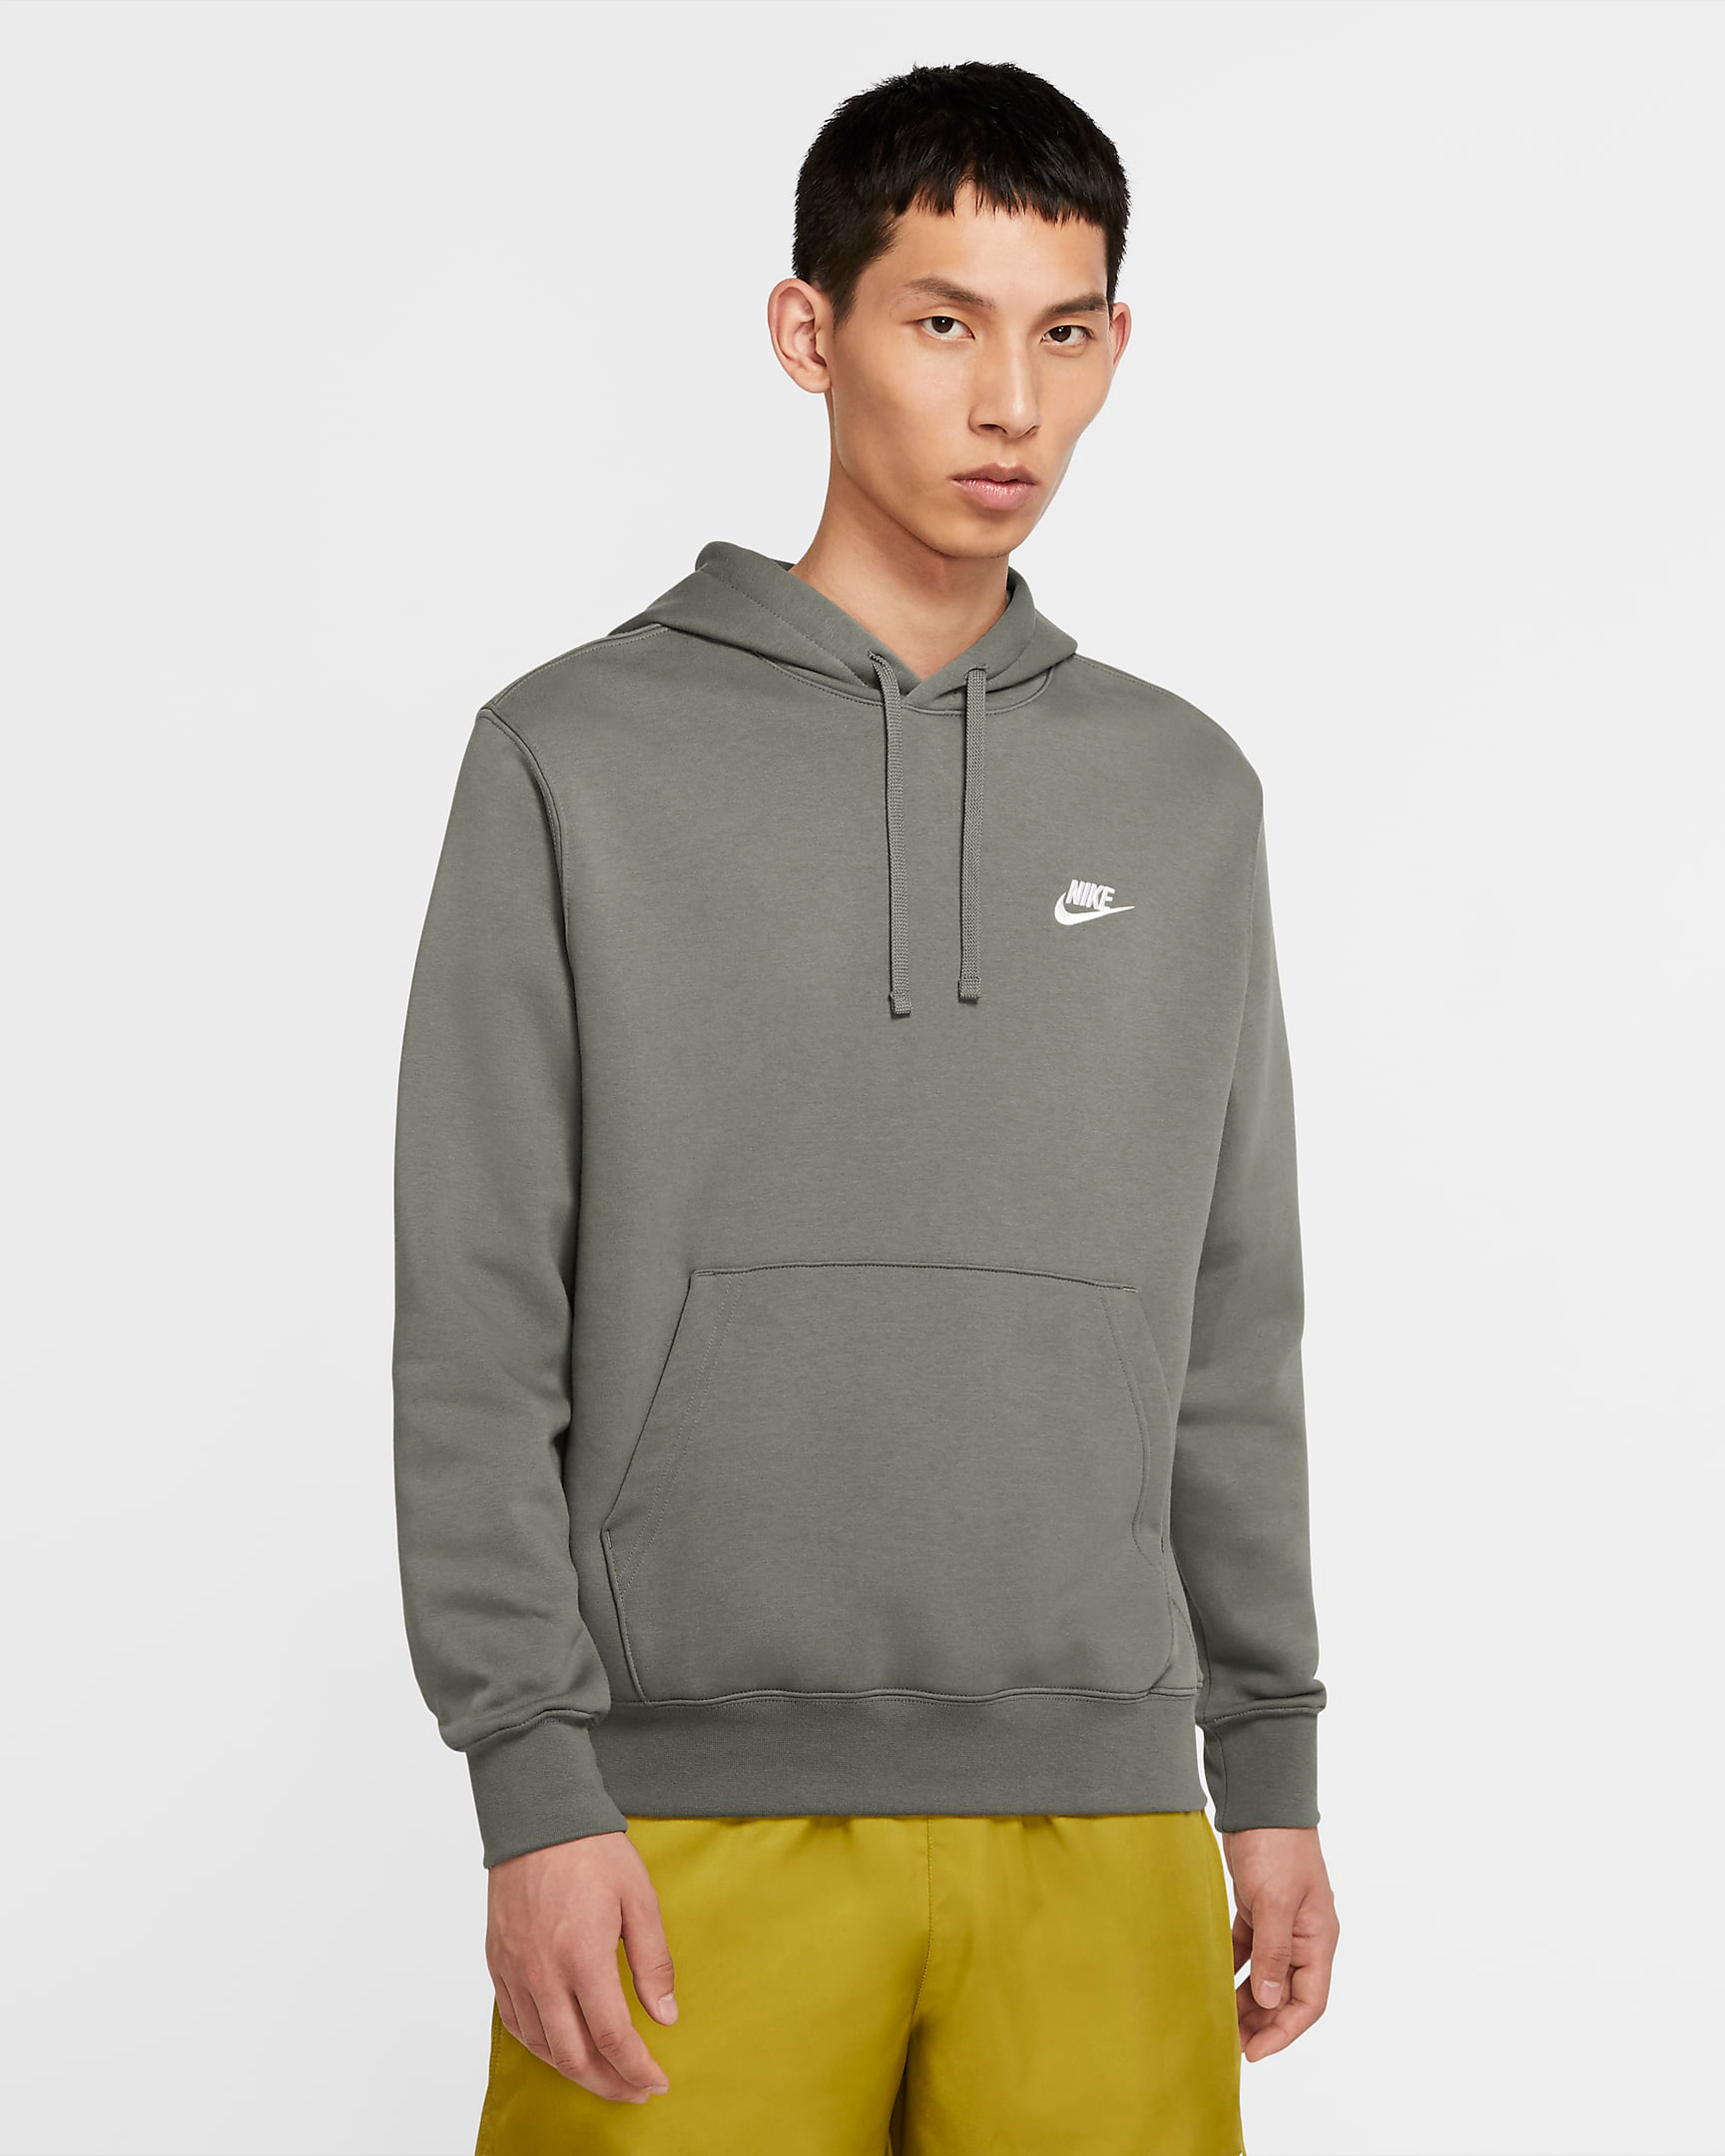 nike-light-army-club-fleece-pullover-hoodie